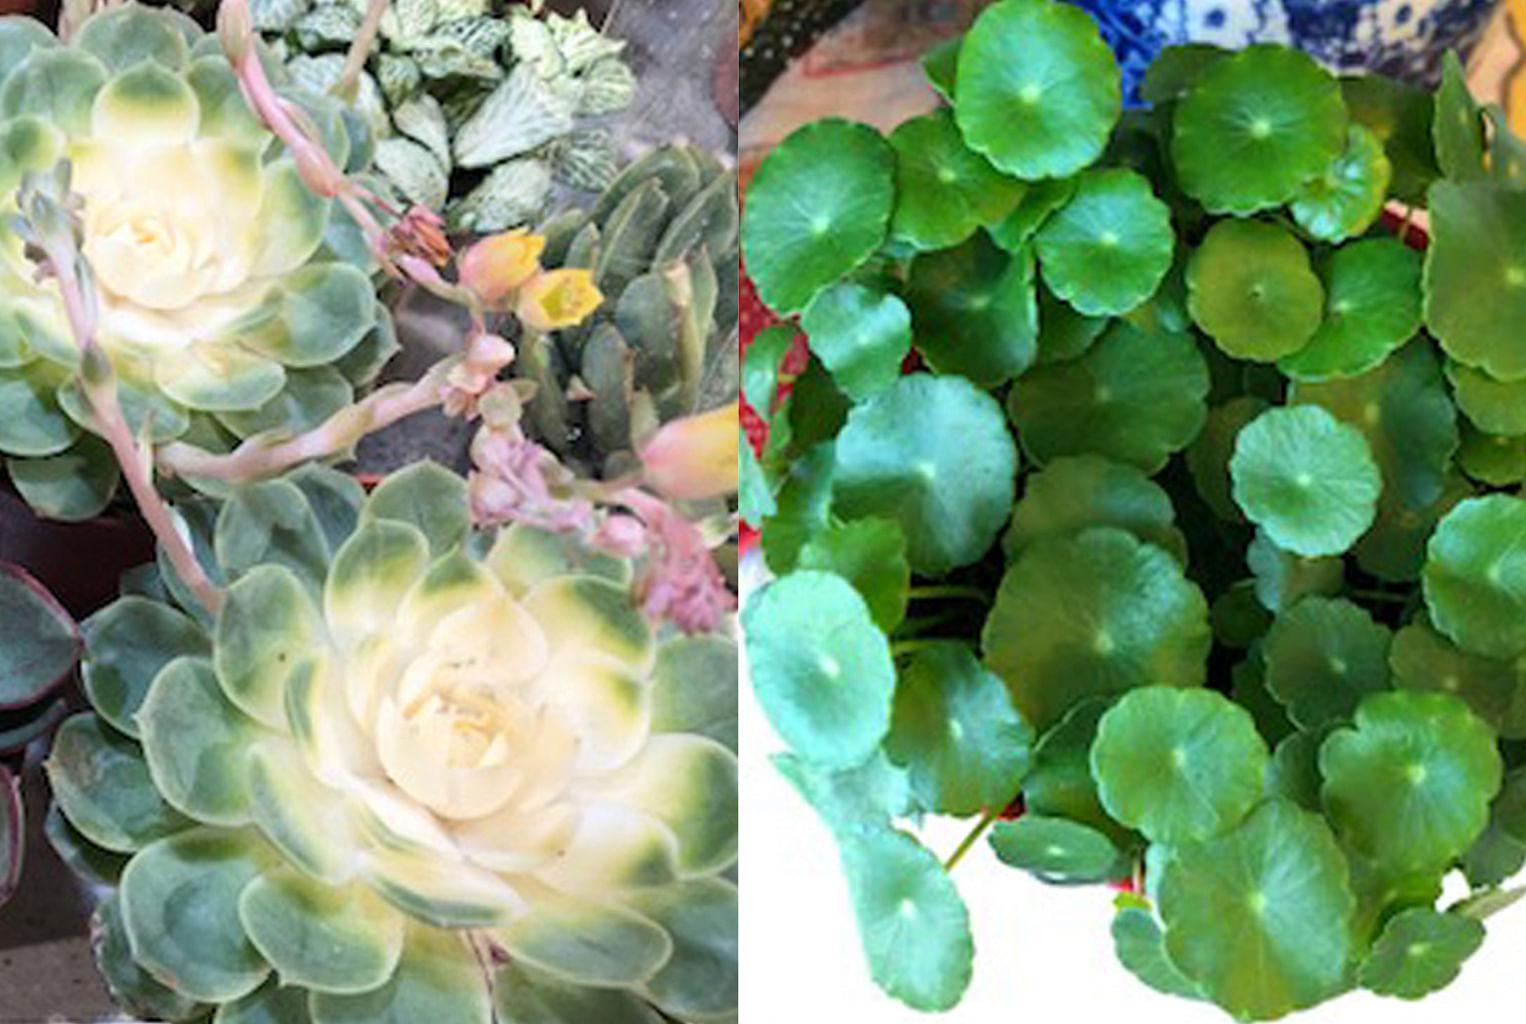 Echeveria (left) and Marsh Pennywort (right)